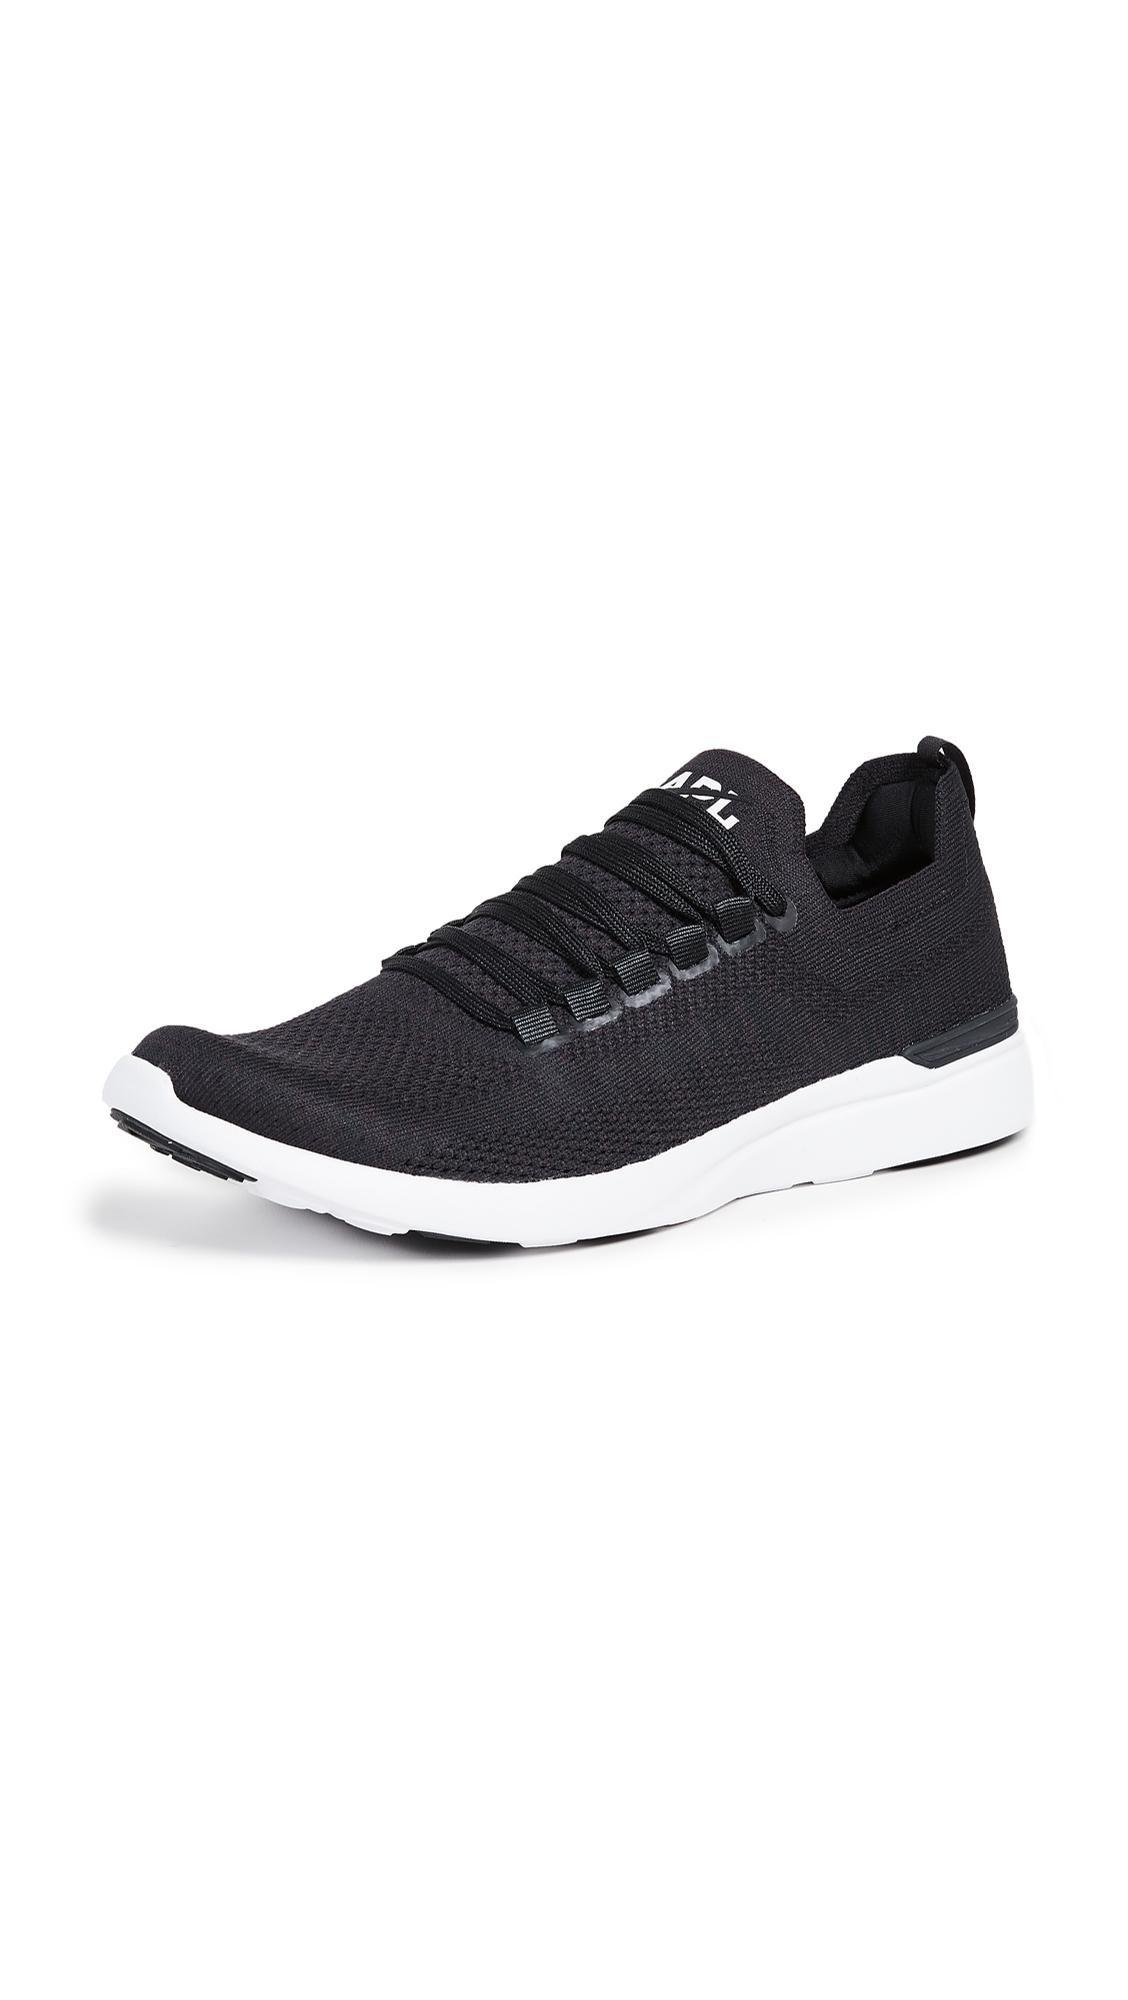 Apl Athletic Propulsion Labs Black Techloom Breeze Running Sneakers